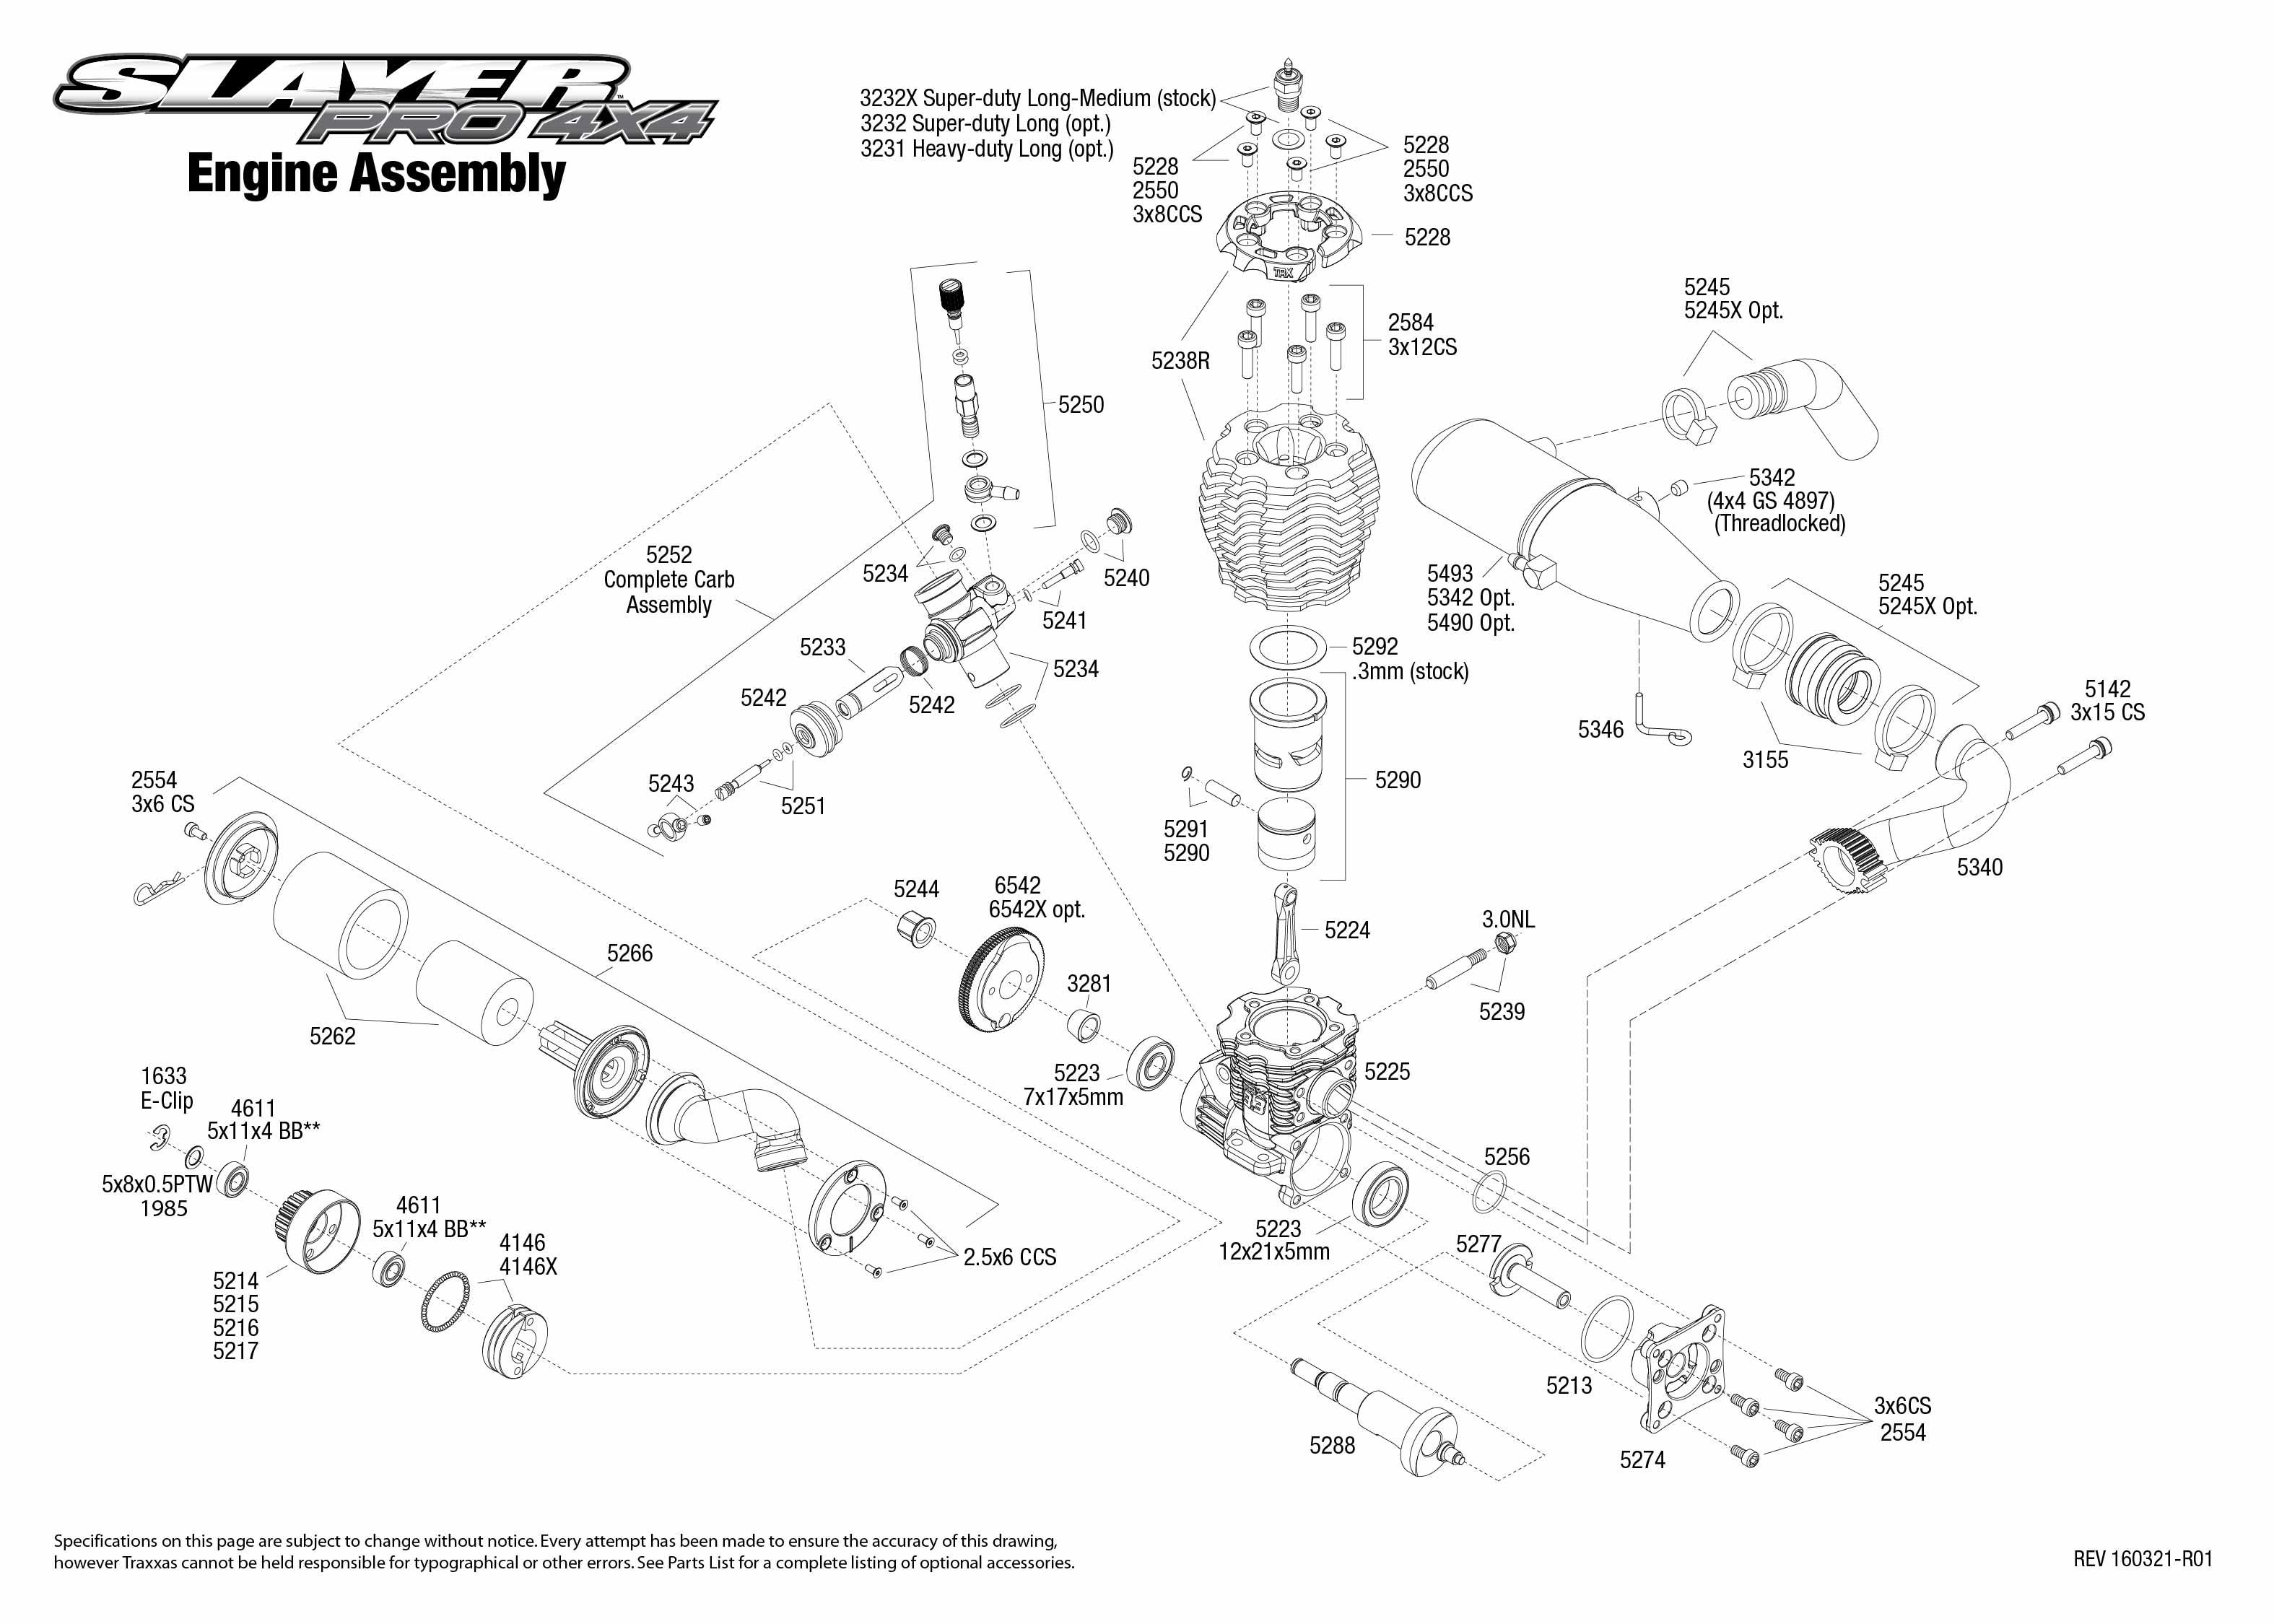 traxxas engine diagram general wiring diagram information u2022 rh velvetfive co uk traxxas 2.5 engine parts diagram traxxas 3.3 engine parts diagram